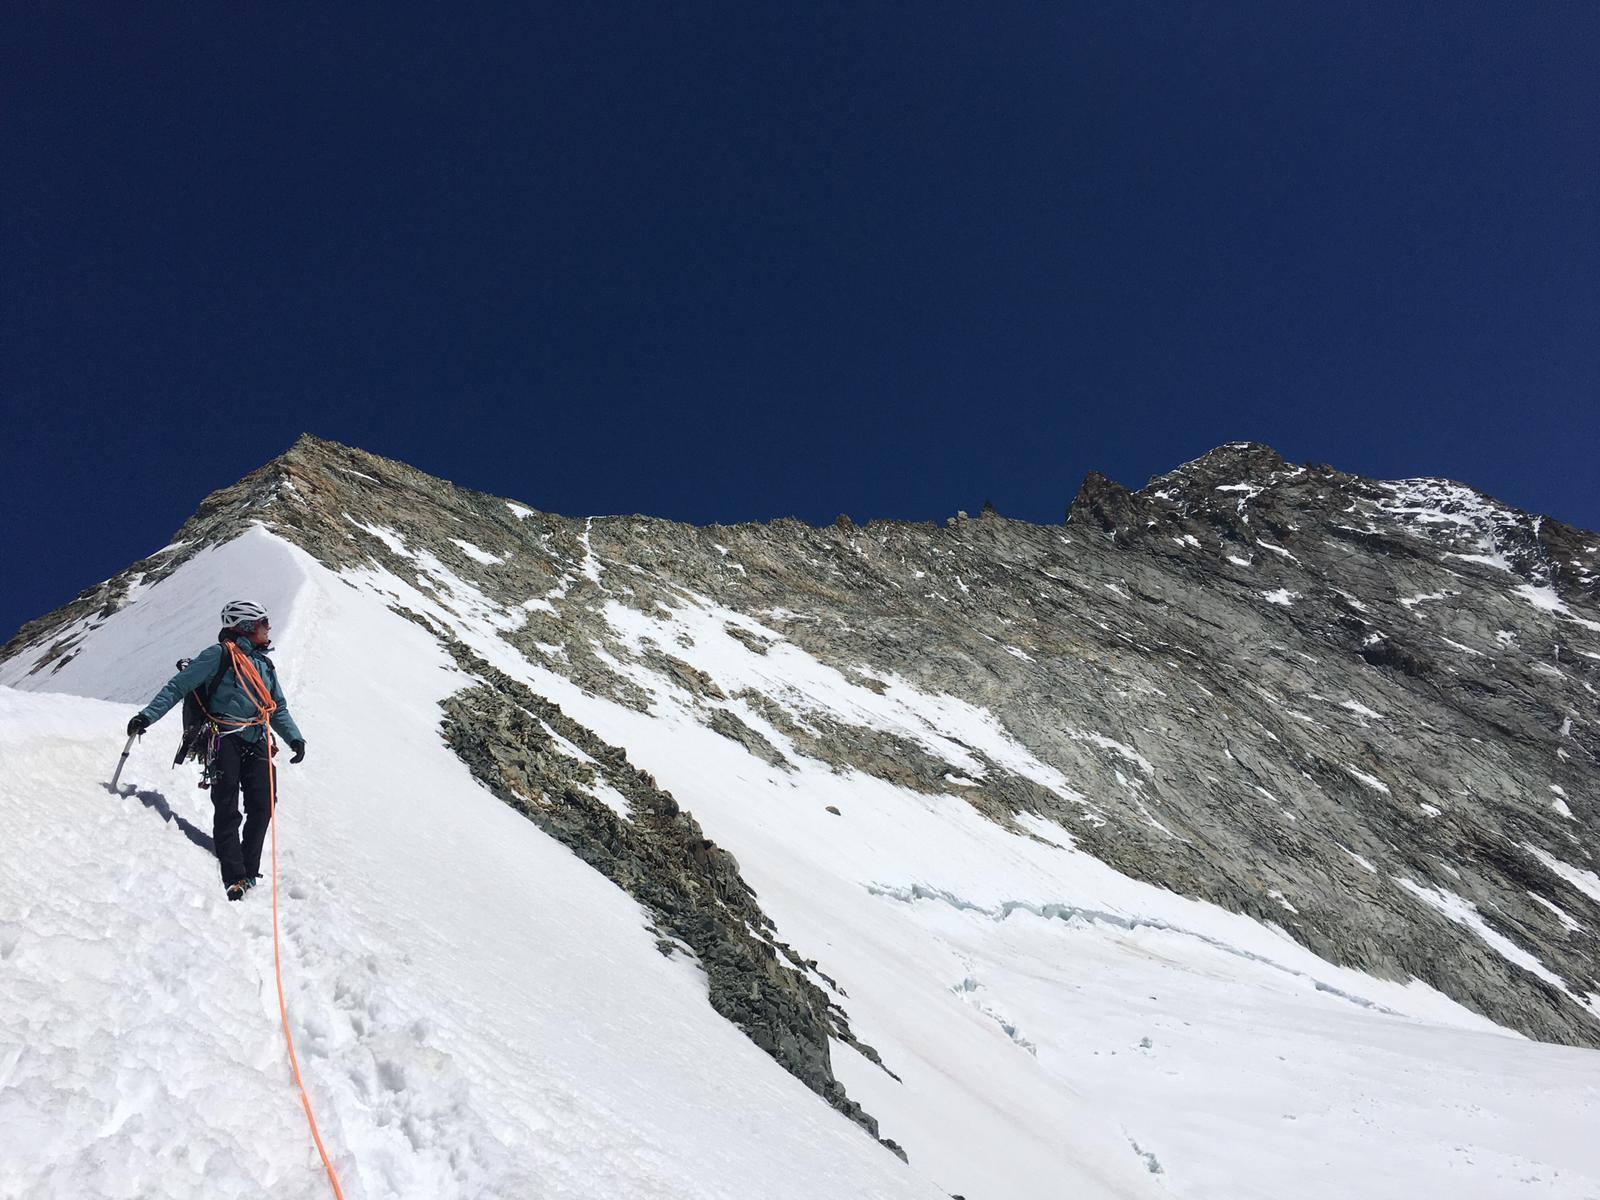 Sofia Muigg - alpin unterwege, Foto: Quirin Chalupar |Climbers Paradise